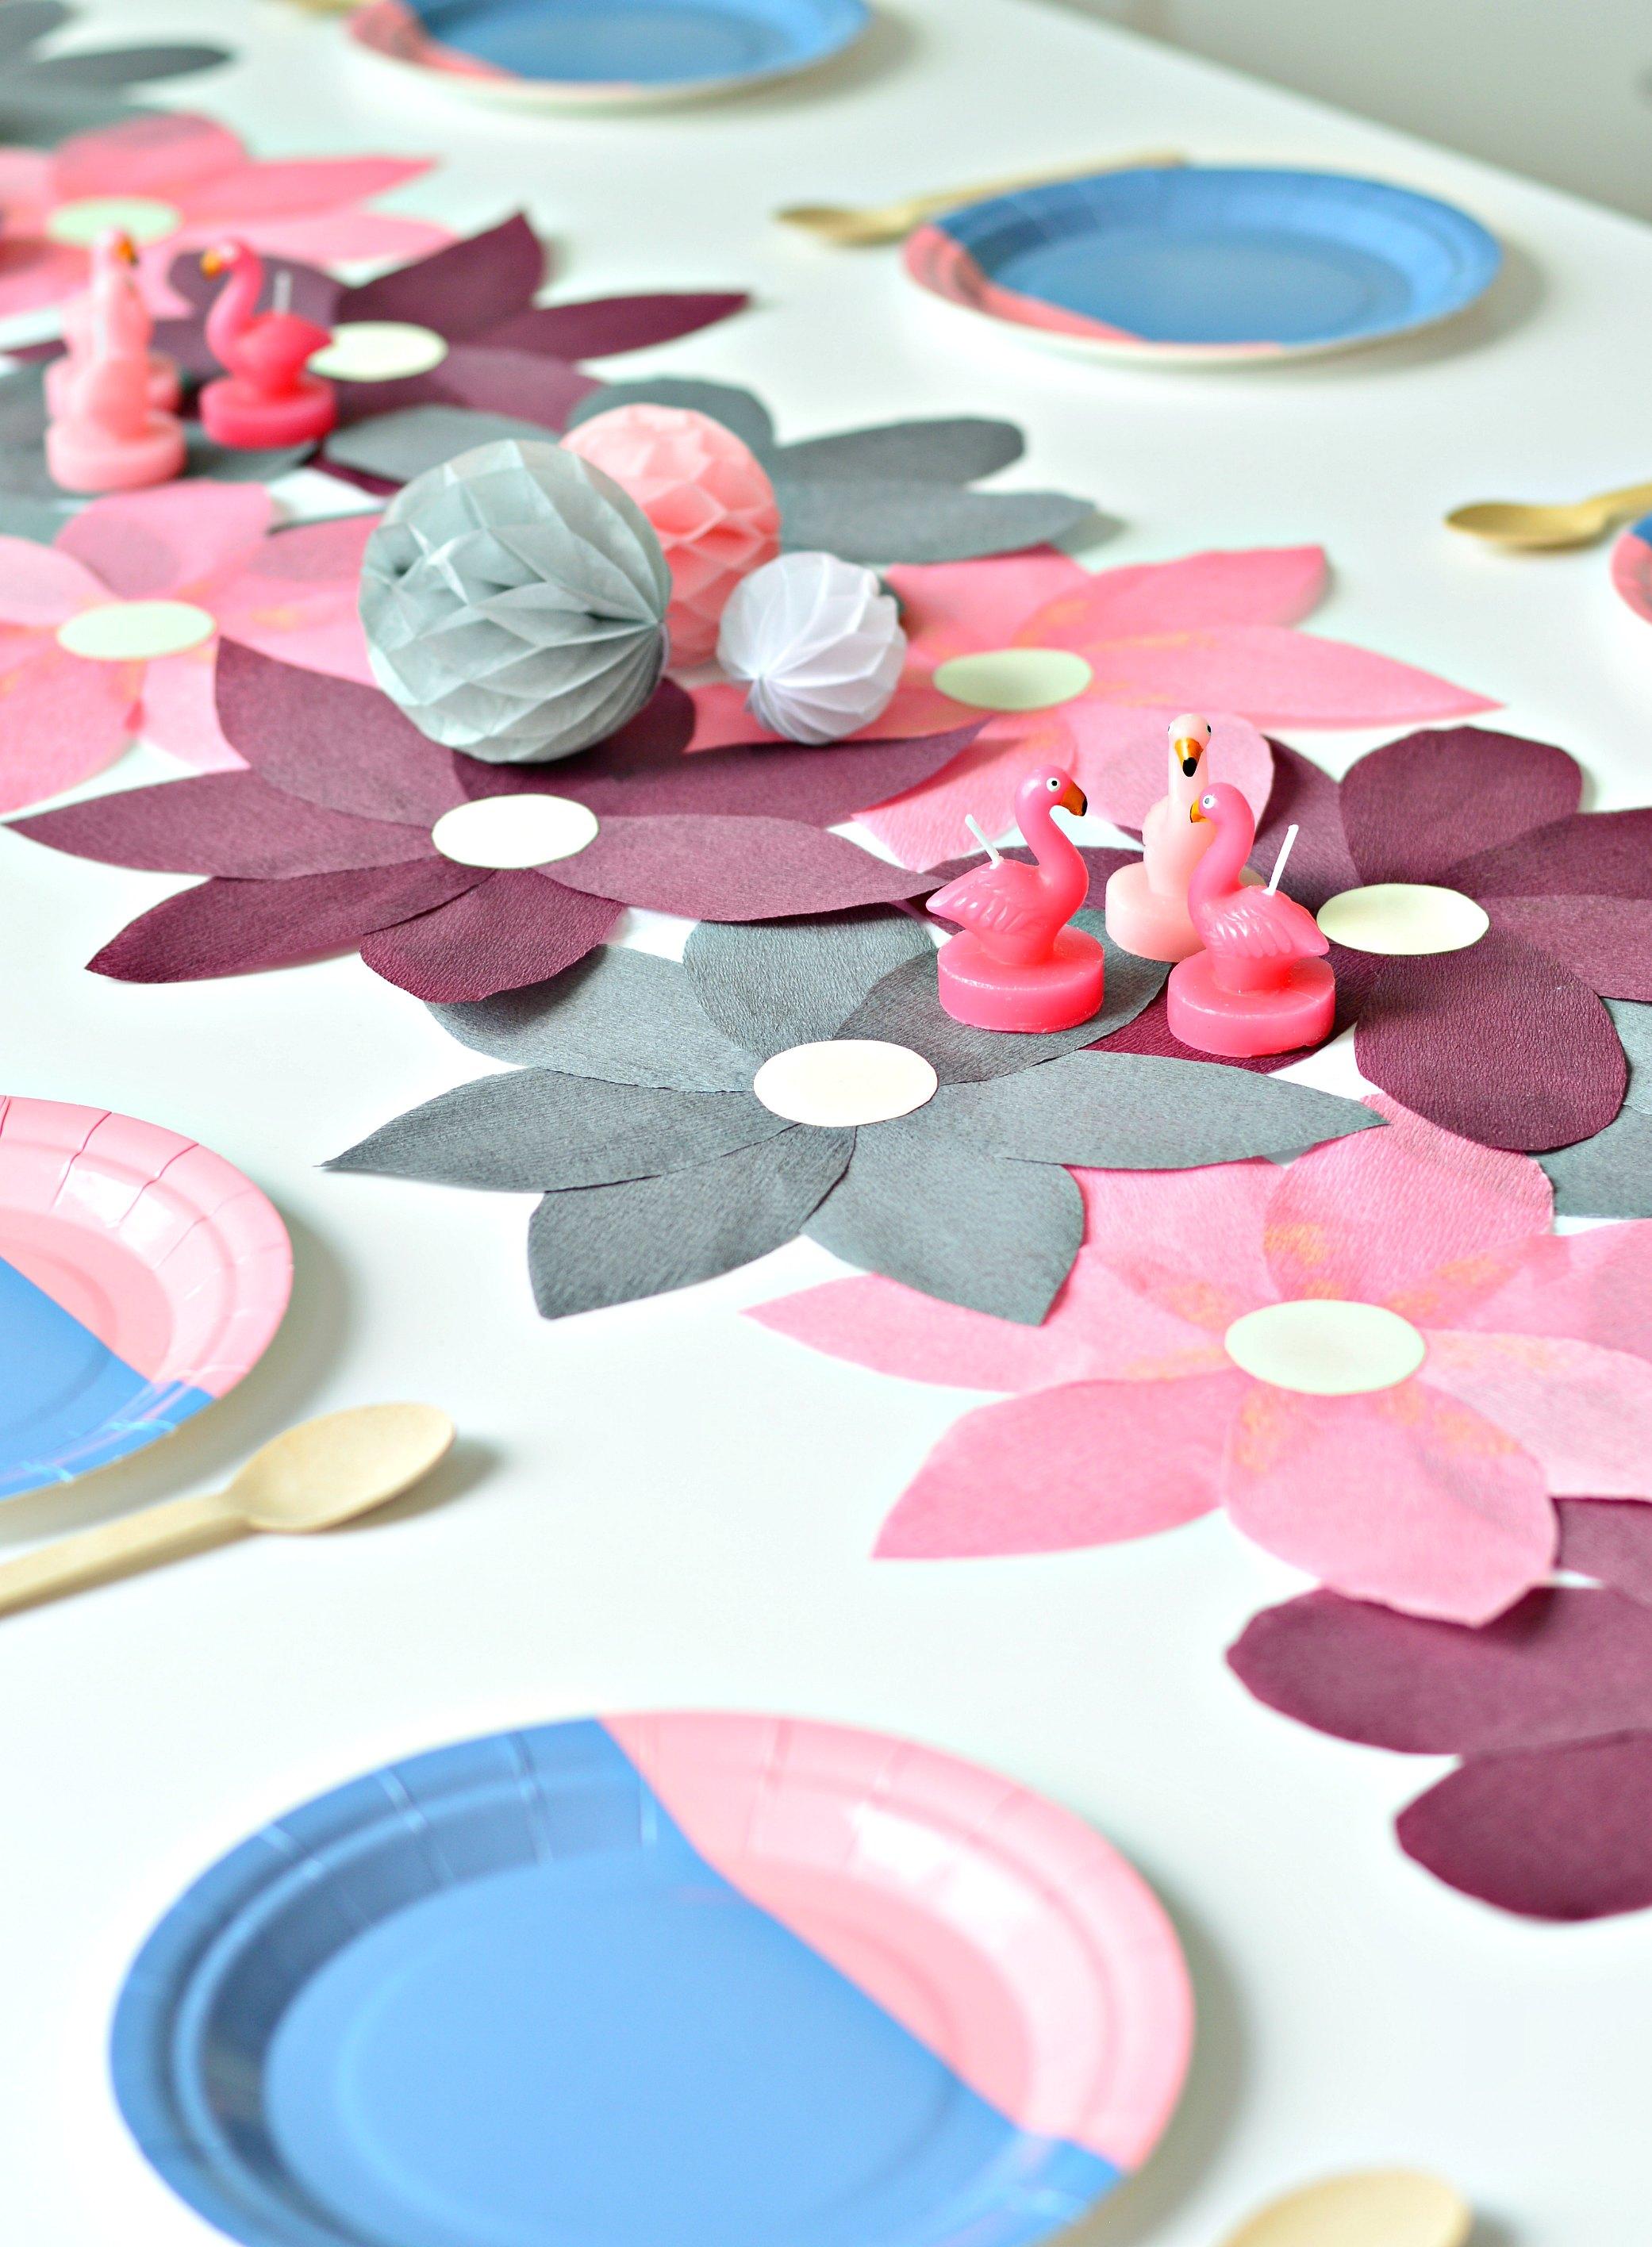 Flower Power Diy Crepe Paper Table Runner Diy Home Decor Your